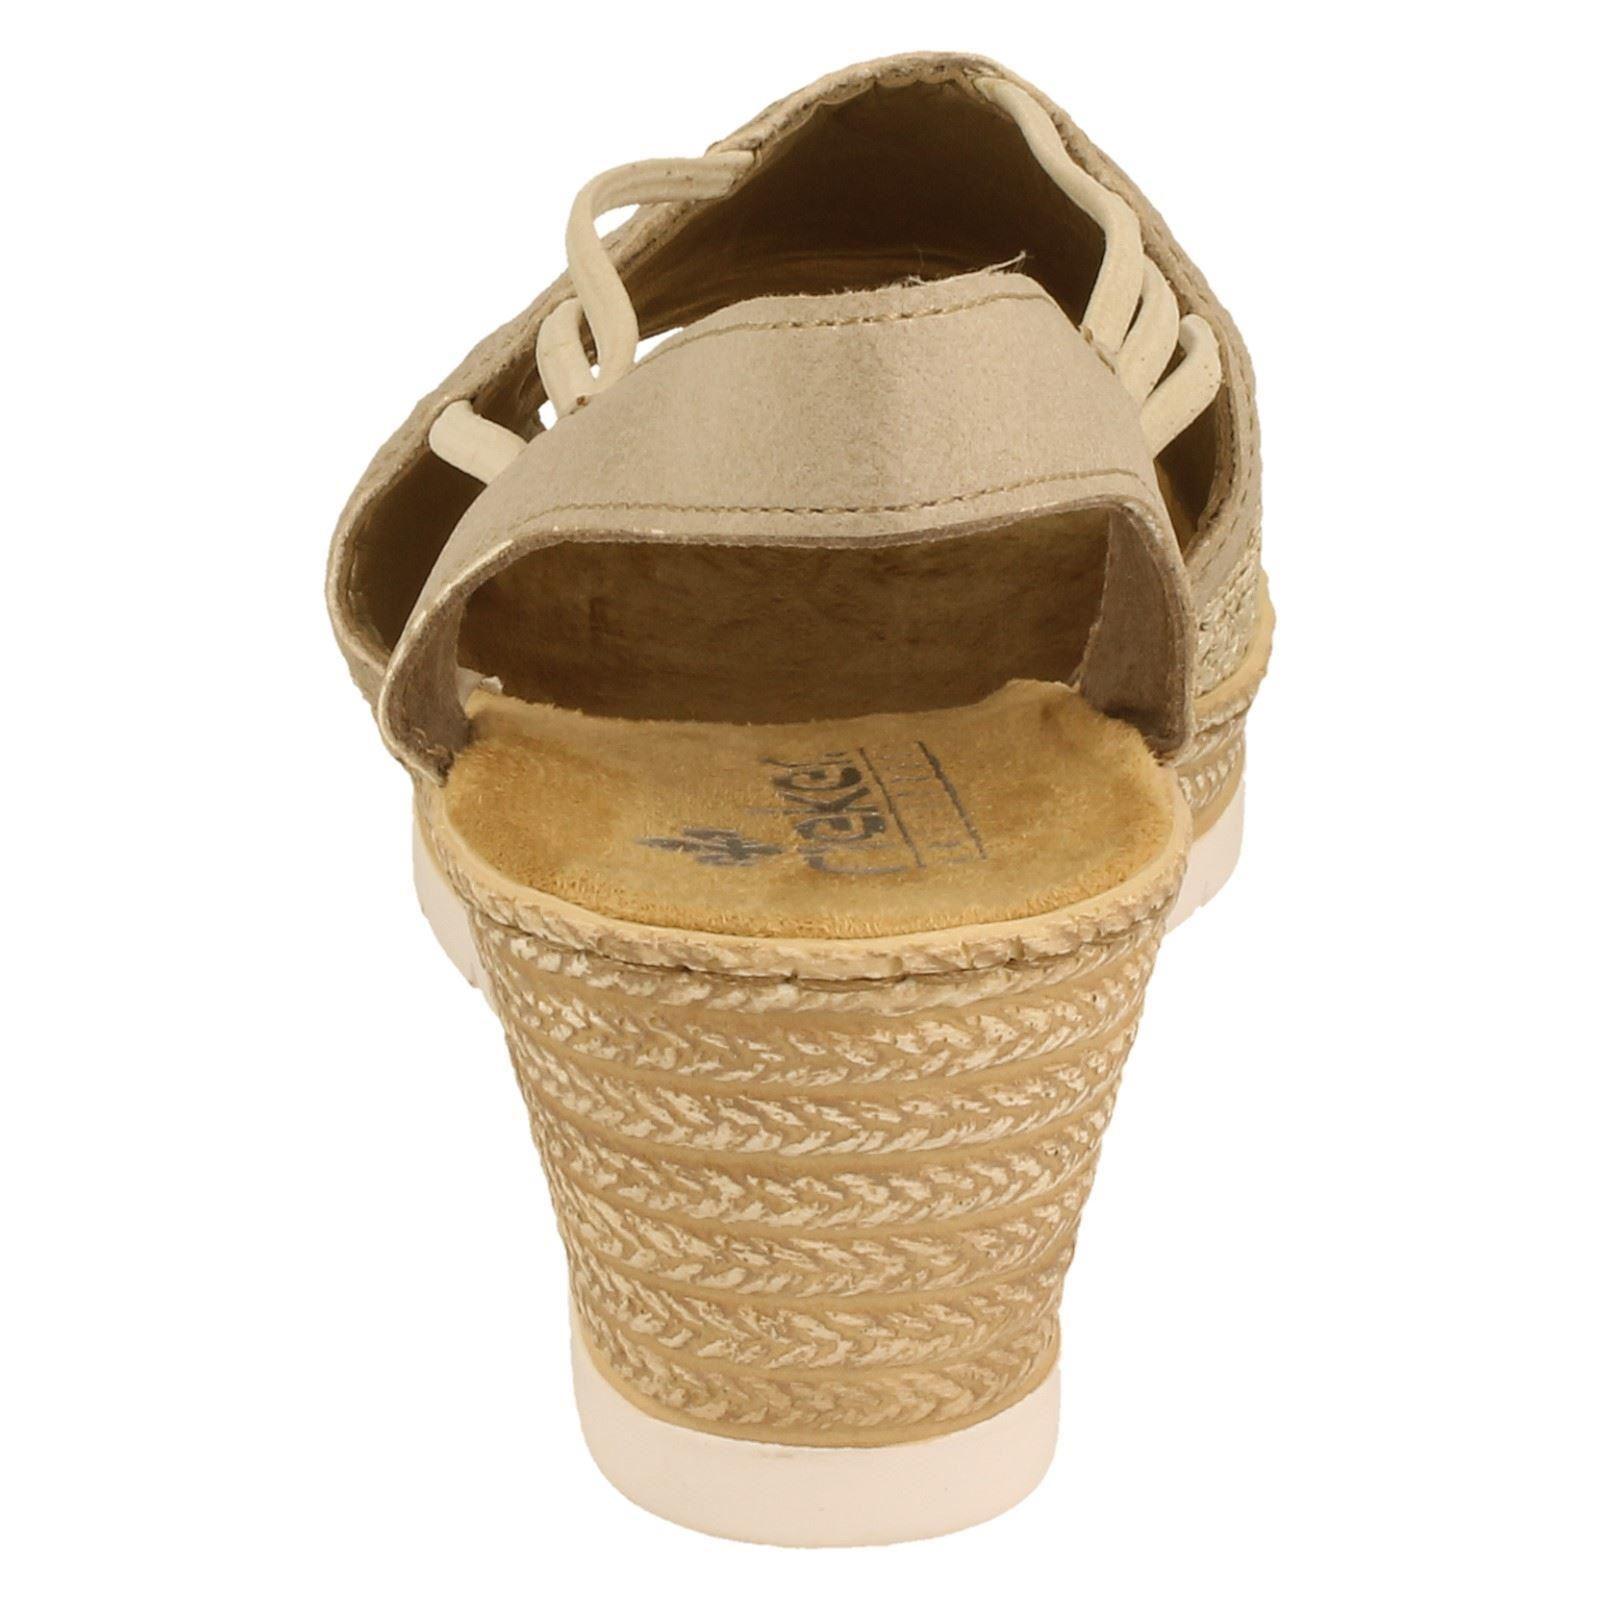 Combination w Label Rieker Ladies 61983 Summer Shoes Beige CwUTT0qn